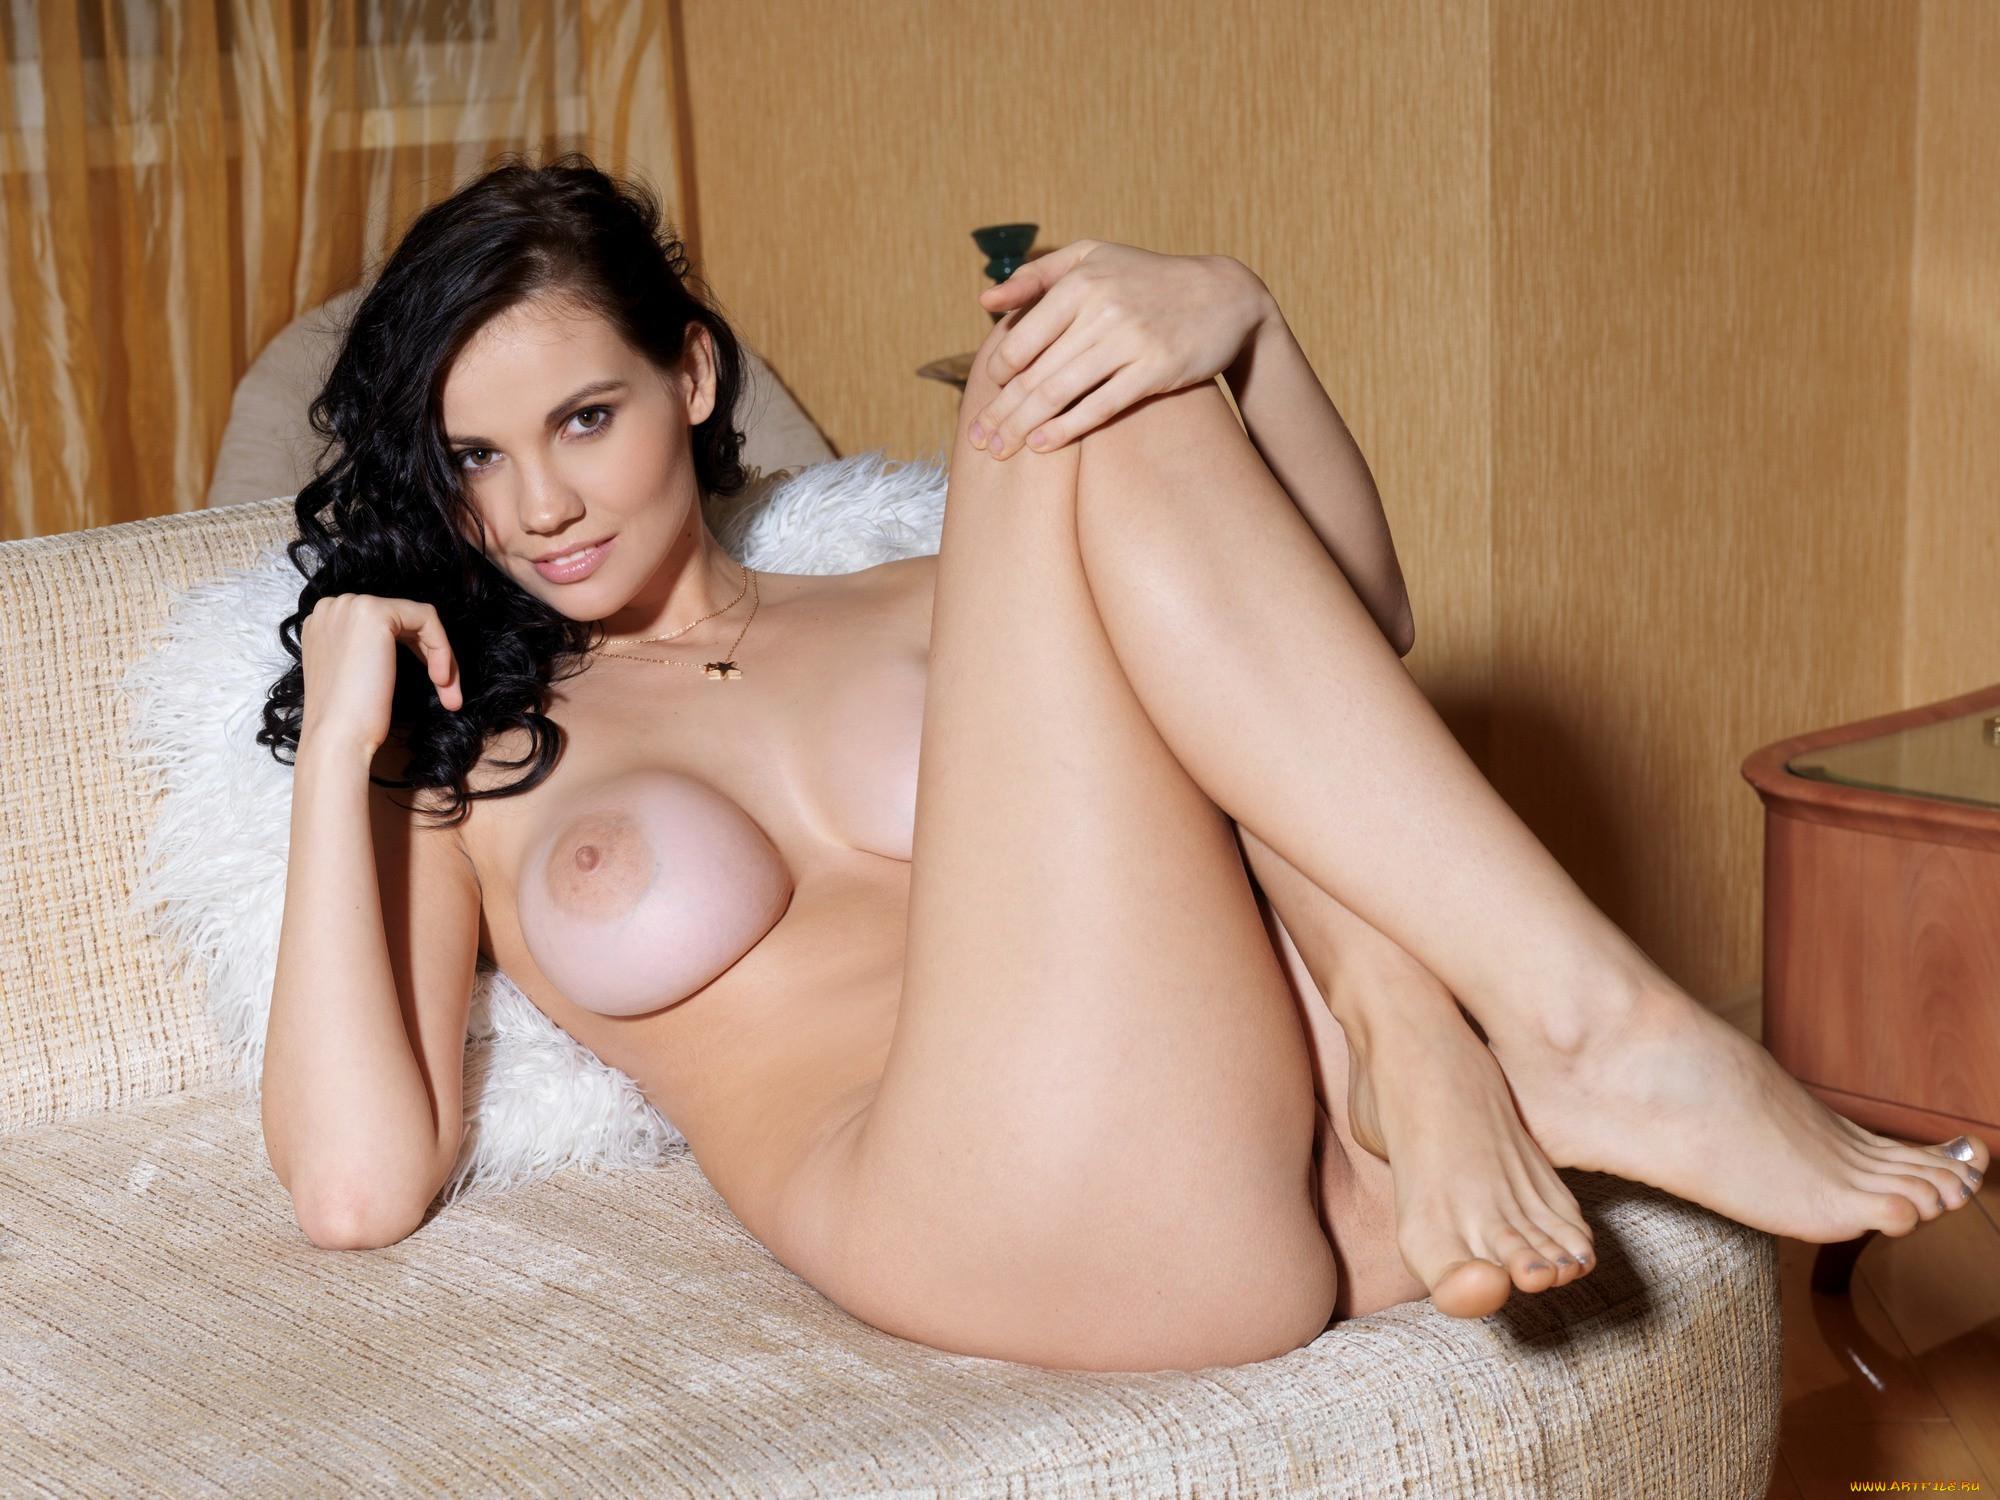 Porn lara dutta full nude